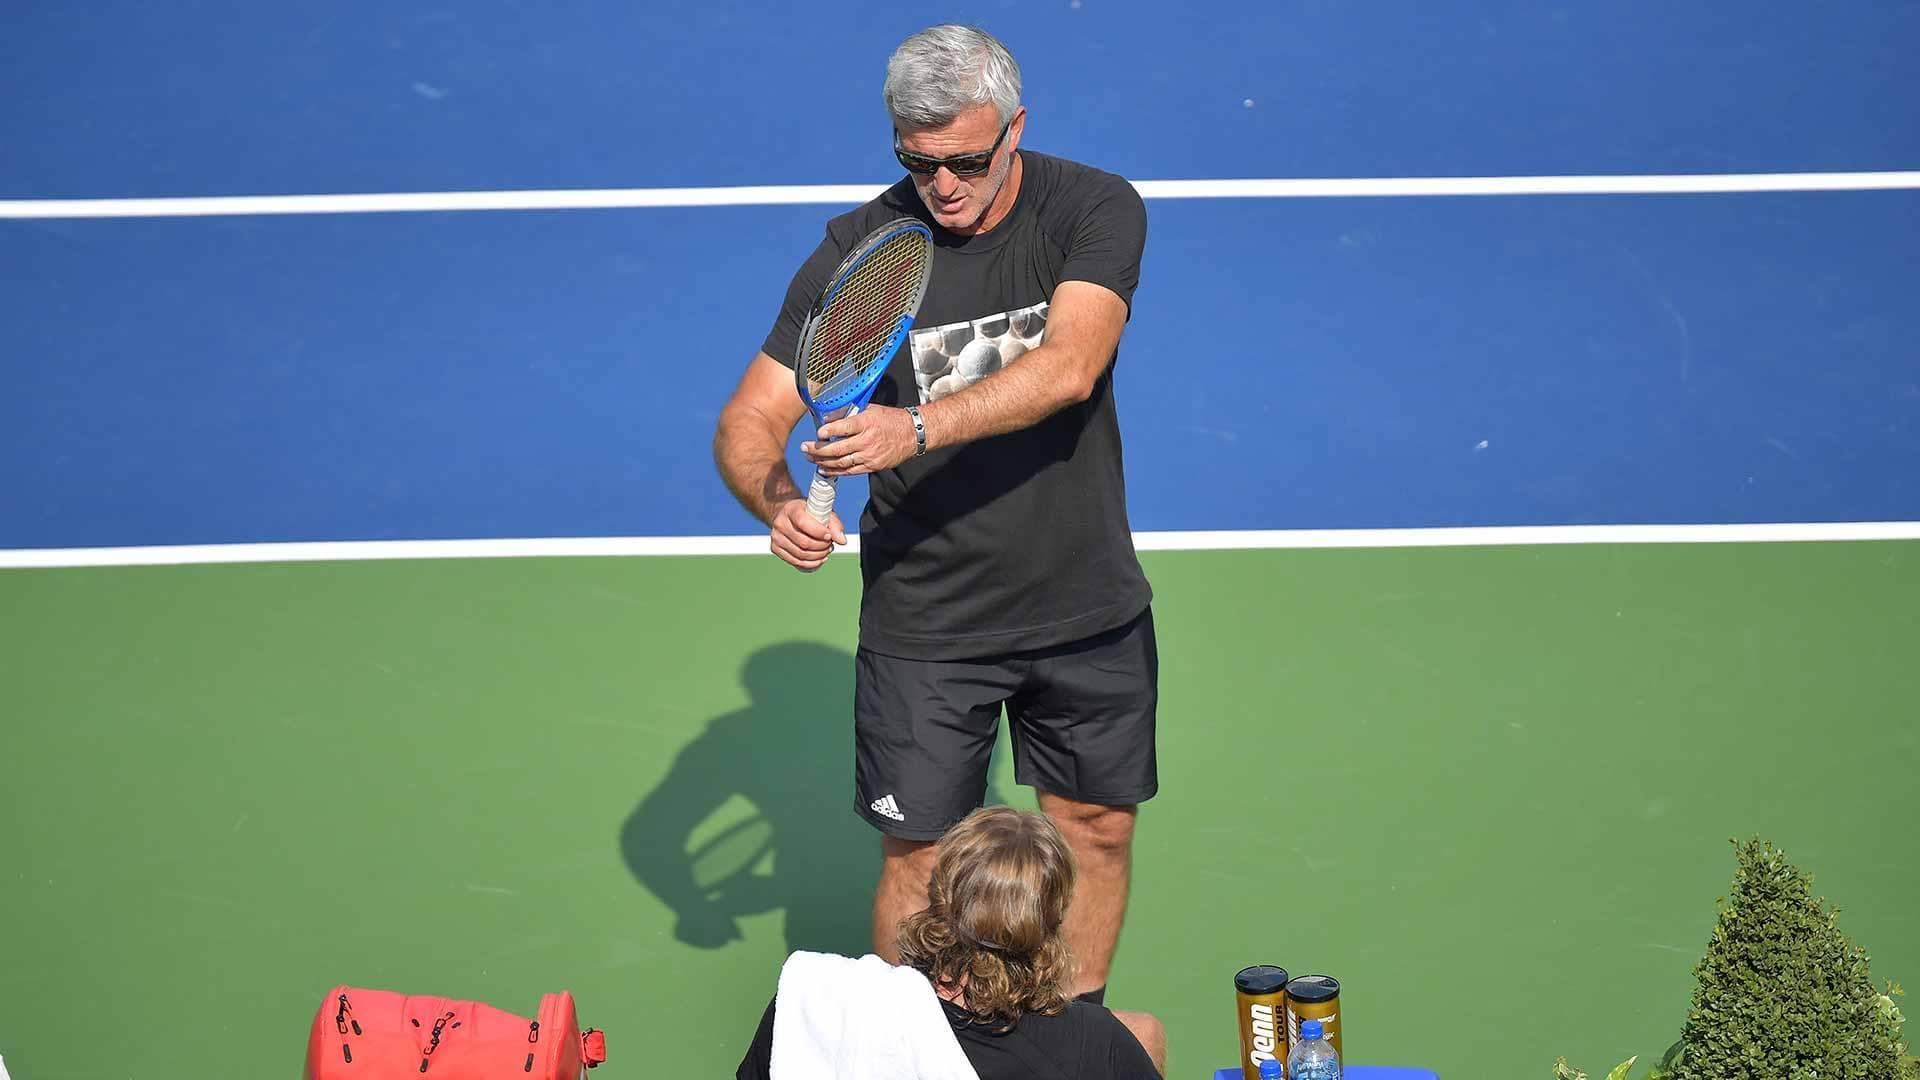 Apostolos Tsitsipas Coach Of Stefanos Tsitsipas Nitto Atp Finals Champion The Accidental Tennis Coach Atp Tour Tennis